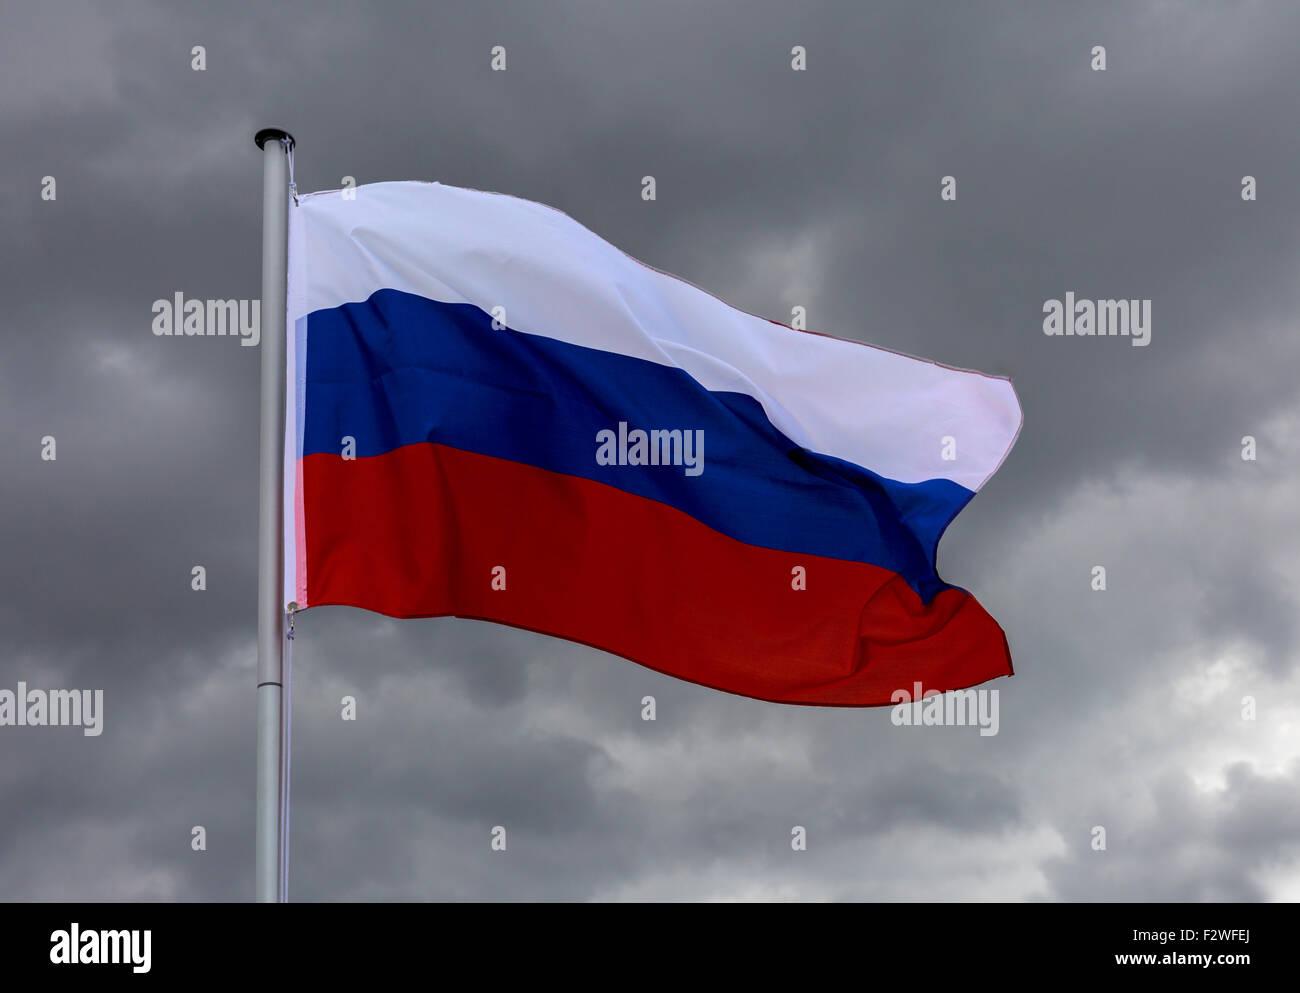 18.04.2015, Berlin, Berlin, Germany - Flag of Russian Federation waving in the wind. 0MK150416D030CAROEX.JPG - NOT - Stock Image